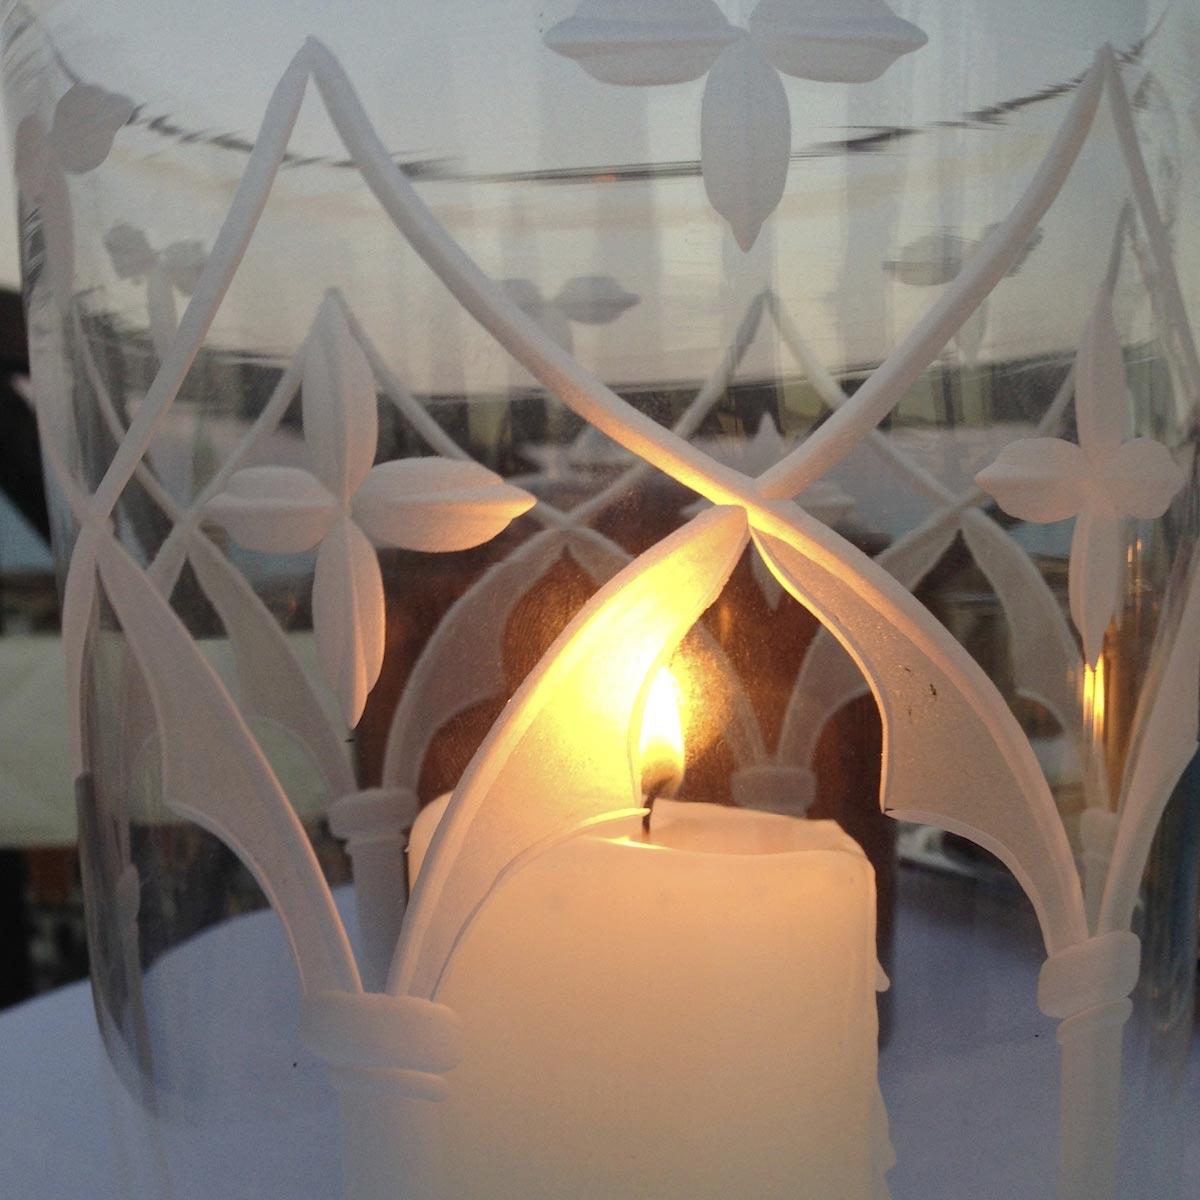 design-candle-giberto-palace-palazzo-murano-cadoro